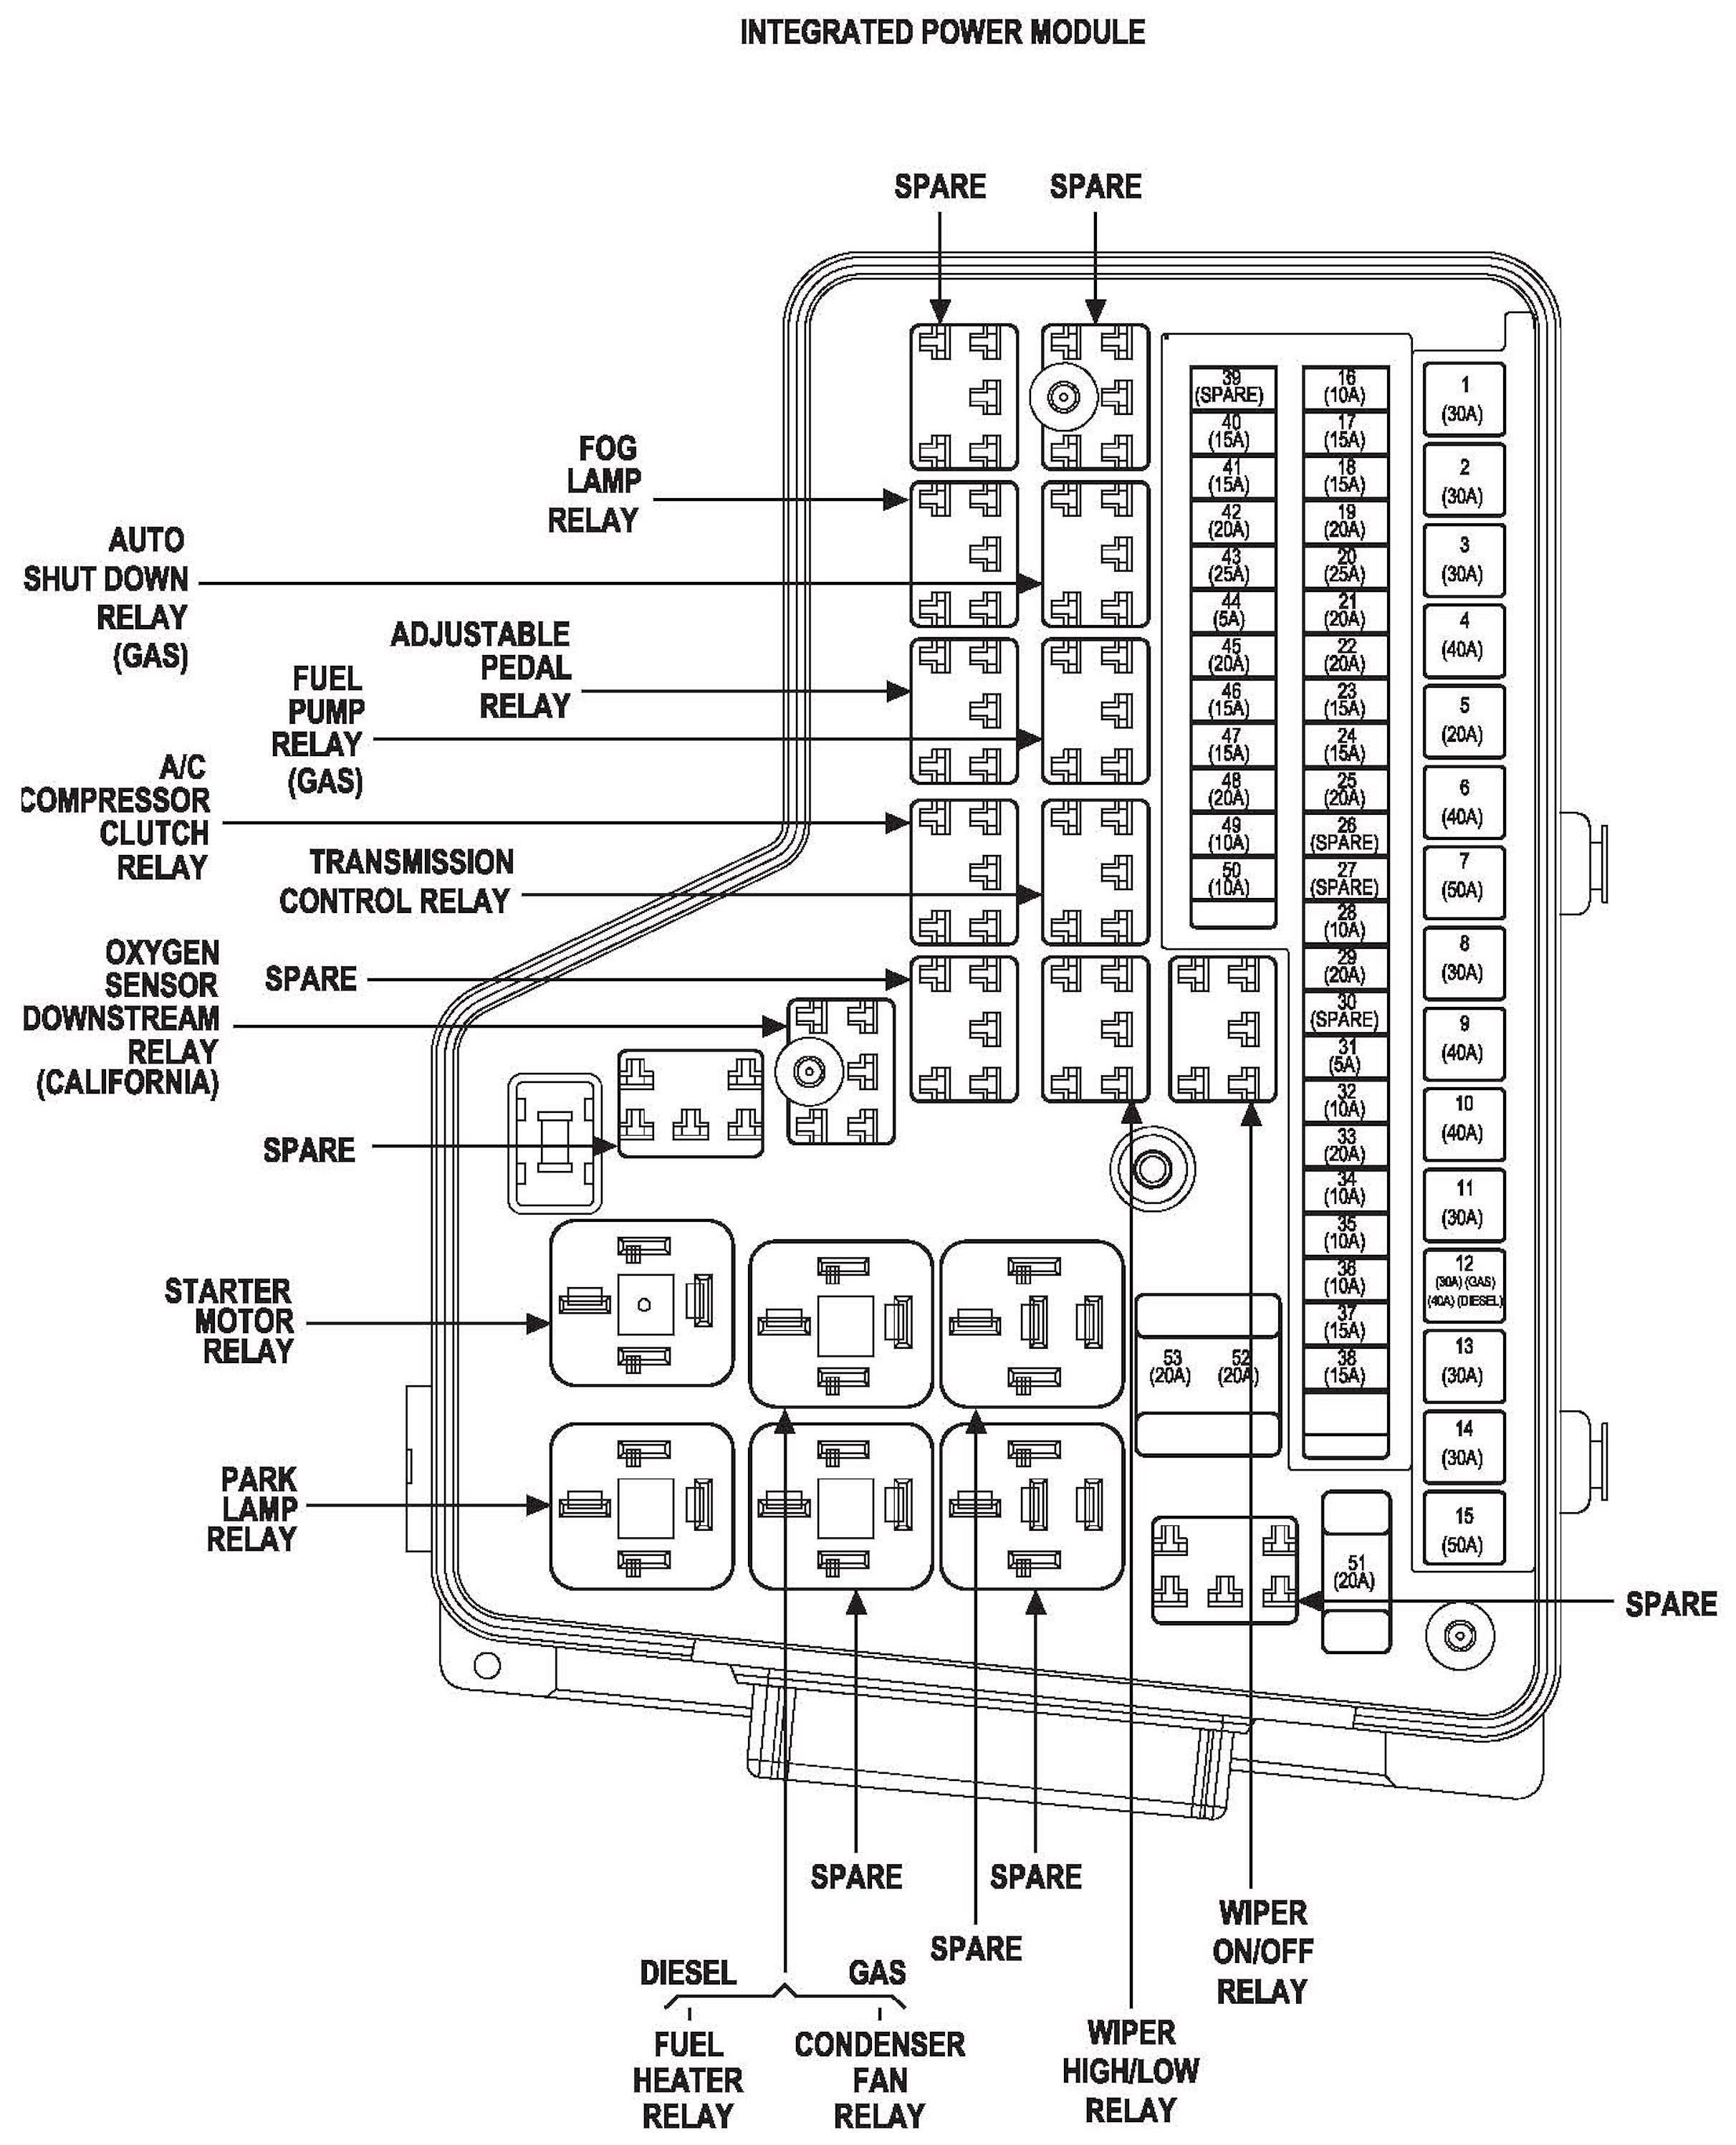 [DIAGRAM_38EU]  2004 Dodge Ram 2500 Fuse Box - Humbucker Wiring Harness for Wiring Diagram  Schematics | 2005 Dodge Ram 2500 Fuse Box Location |  | Wiring Diagram Schematics